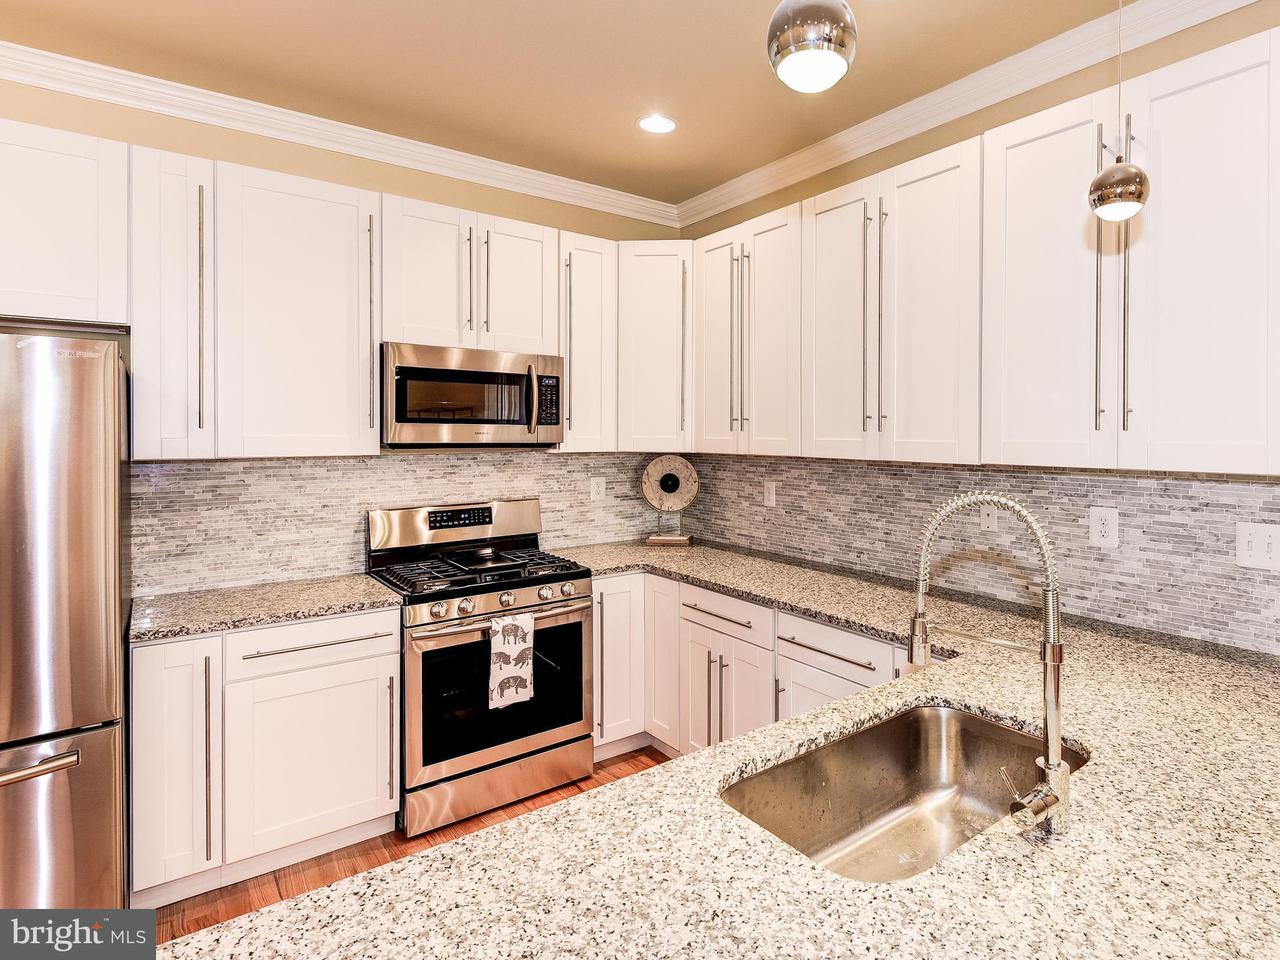 Additional photo for property listing at 1926 1st St Nw #1 1926 1st St Nw #1 Washington, Distrito De Columbia 20001 Estados Unidos